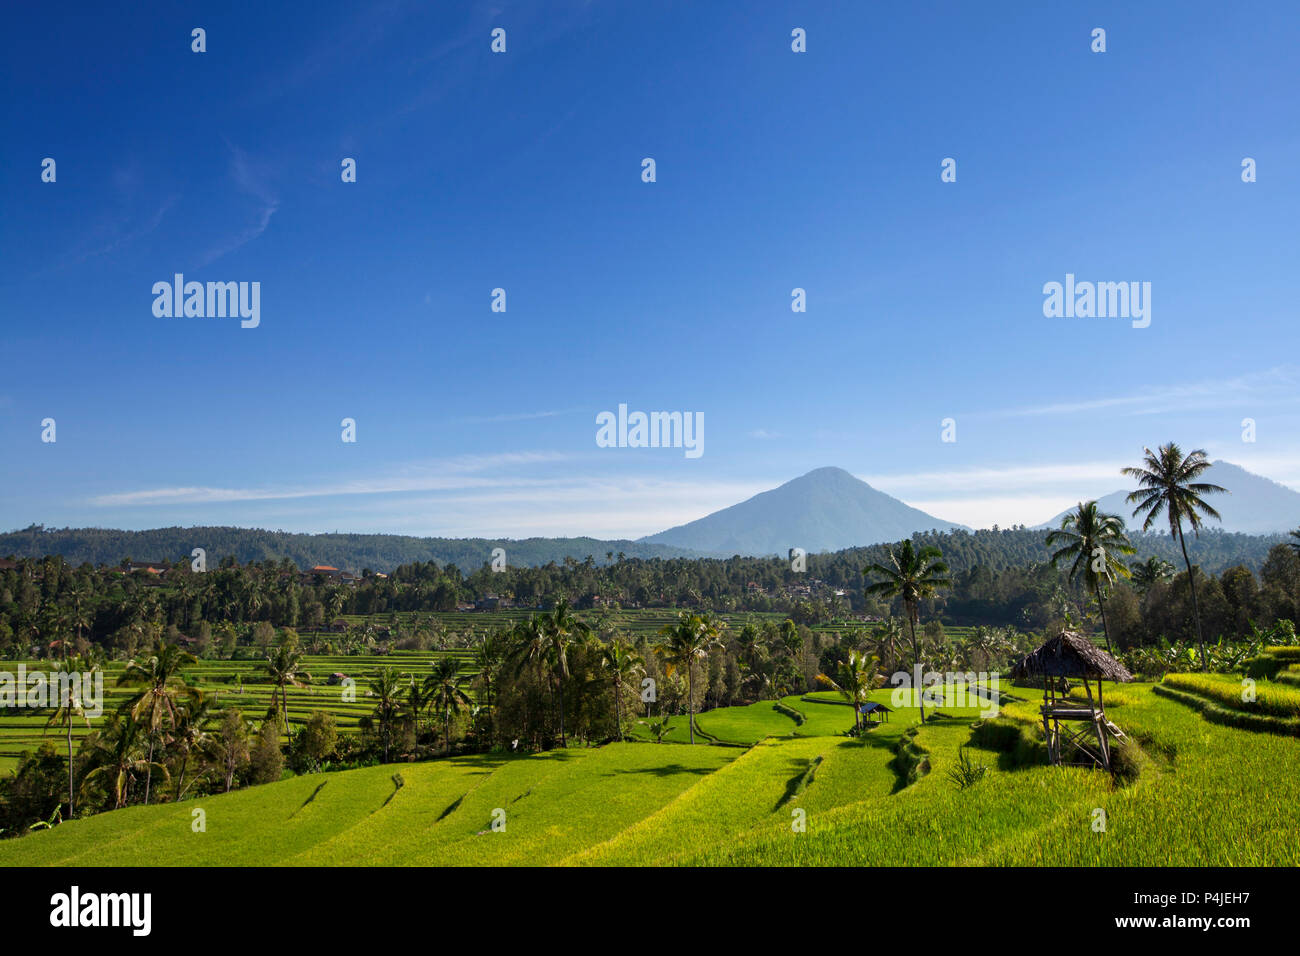 Agung volcano on the sunrise, Bali island in Indonesia - Stock Image